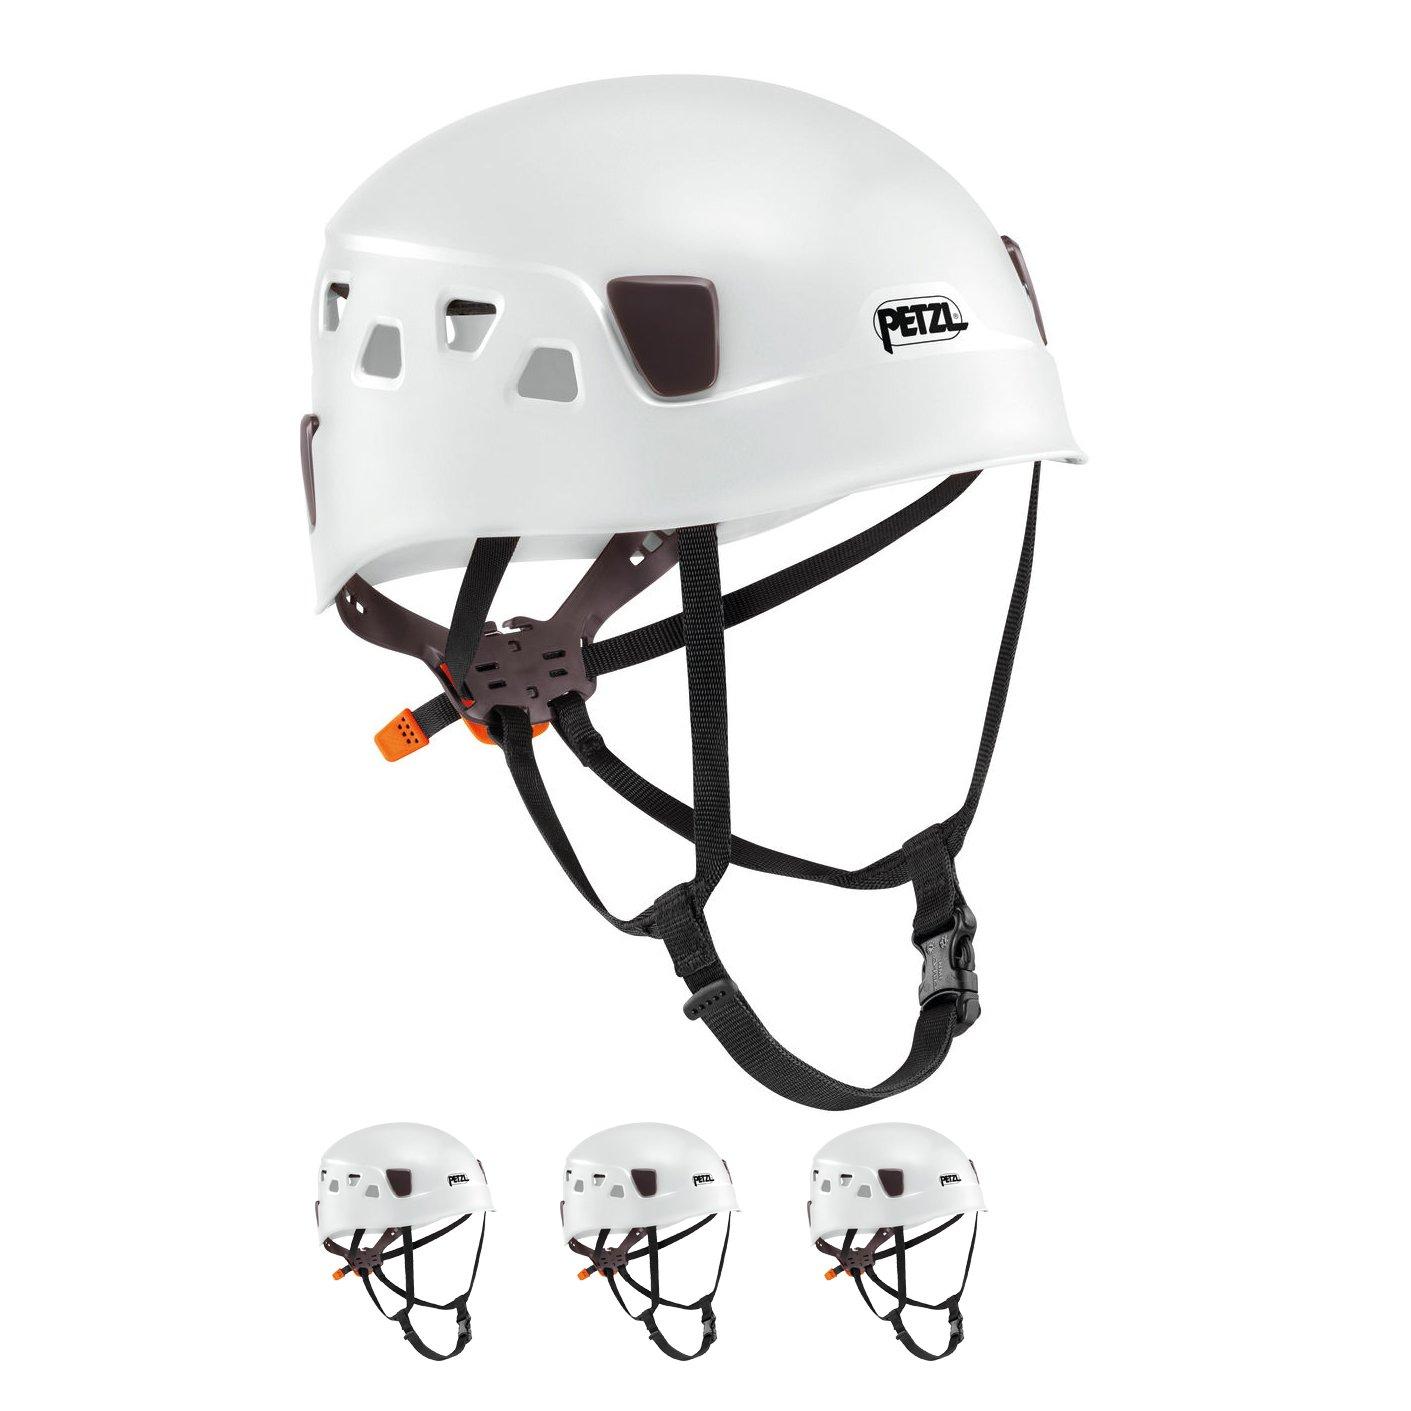 Petzl Panga White Climbing Helmet for Group and Club Use 4 Pack